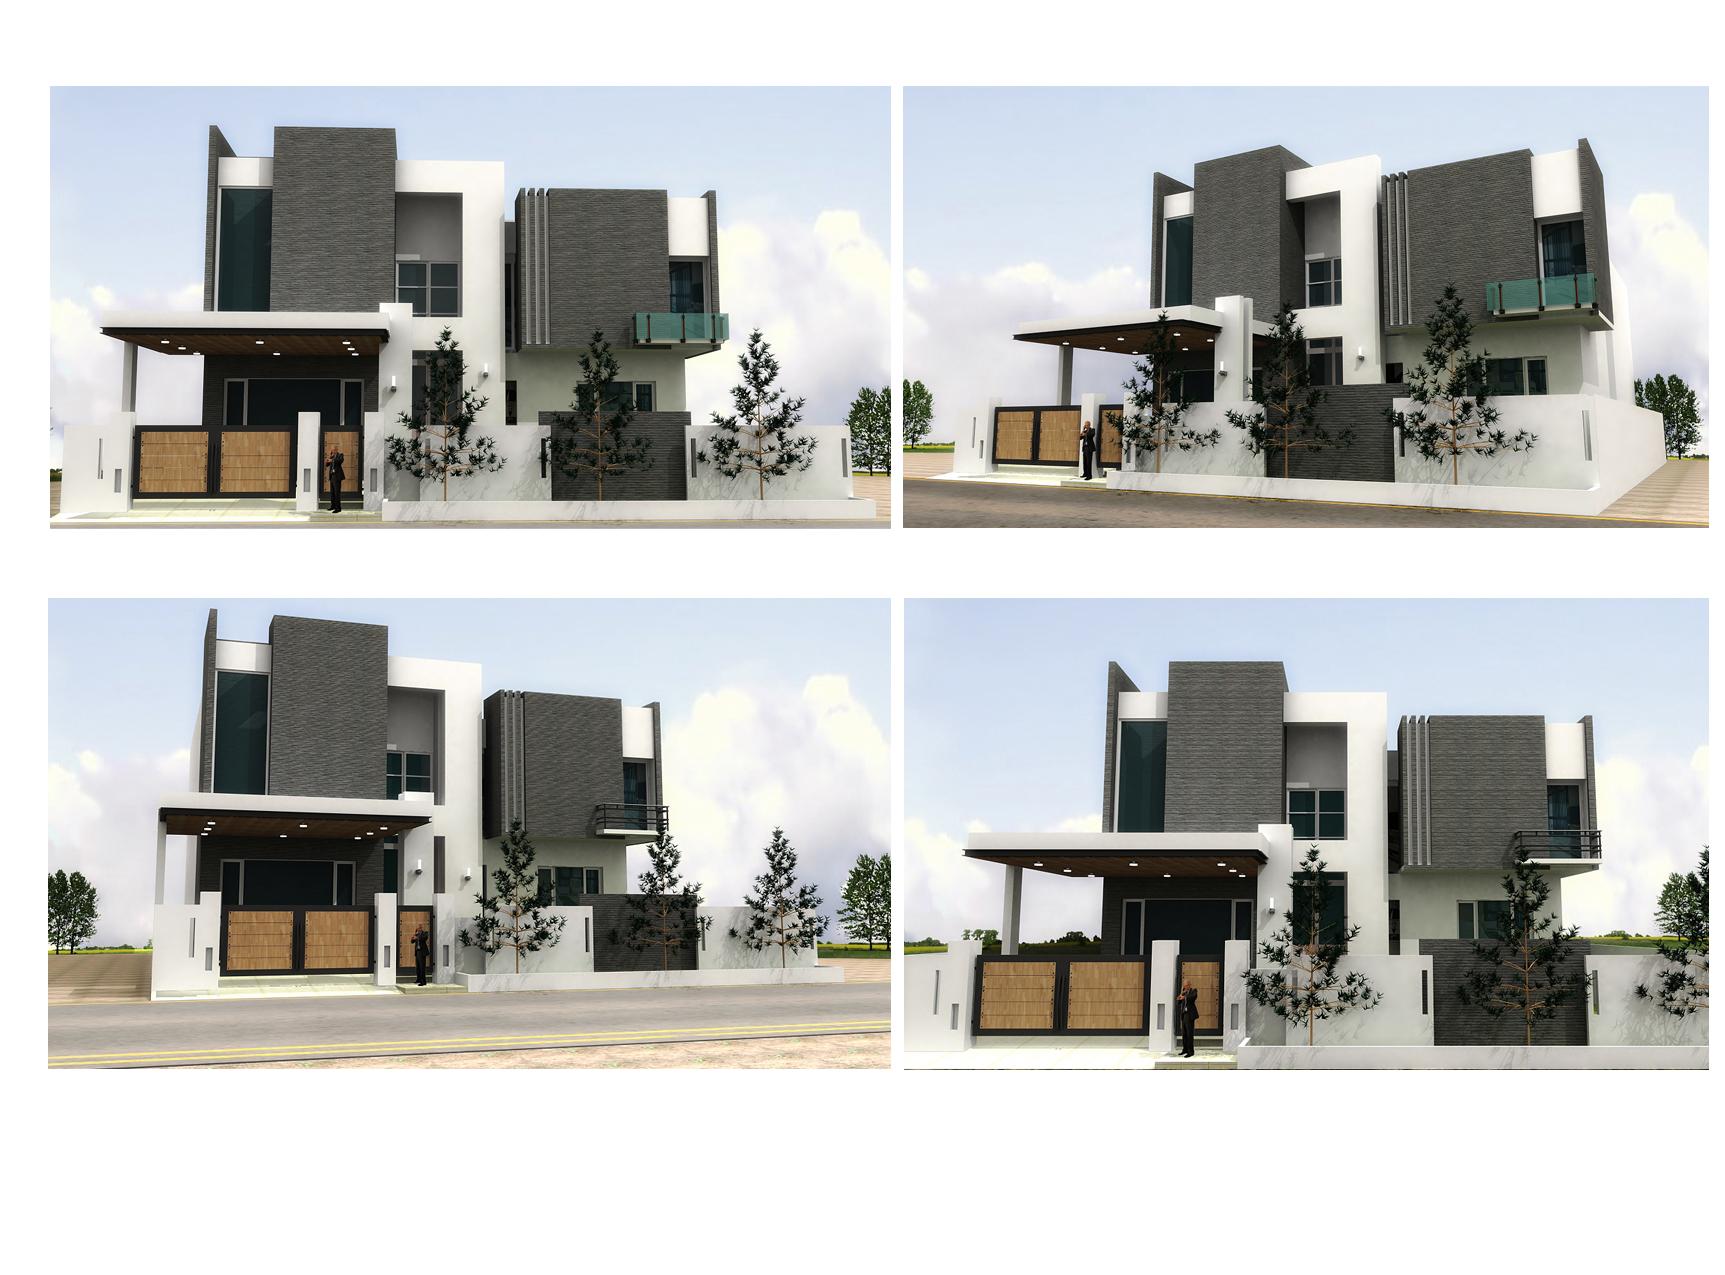 Sami Ullah Building Architecture